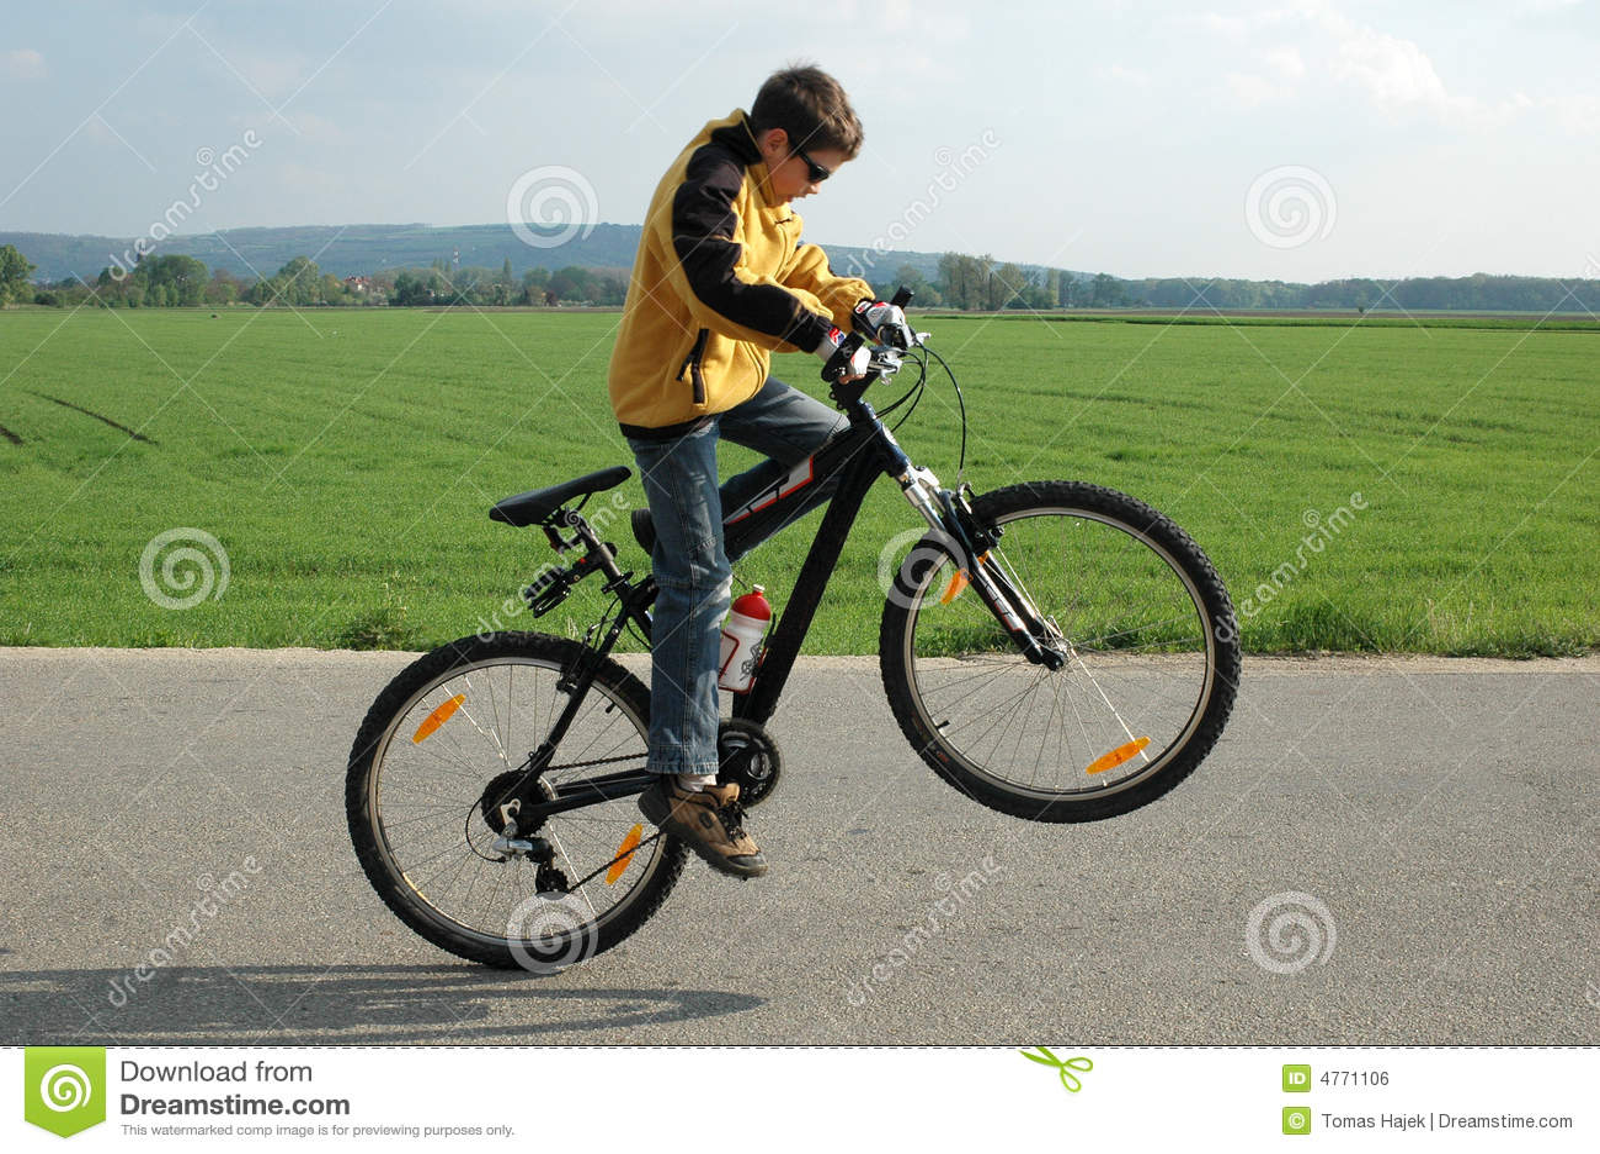 Acrobat on bicycle